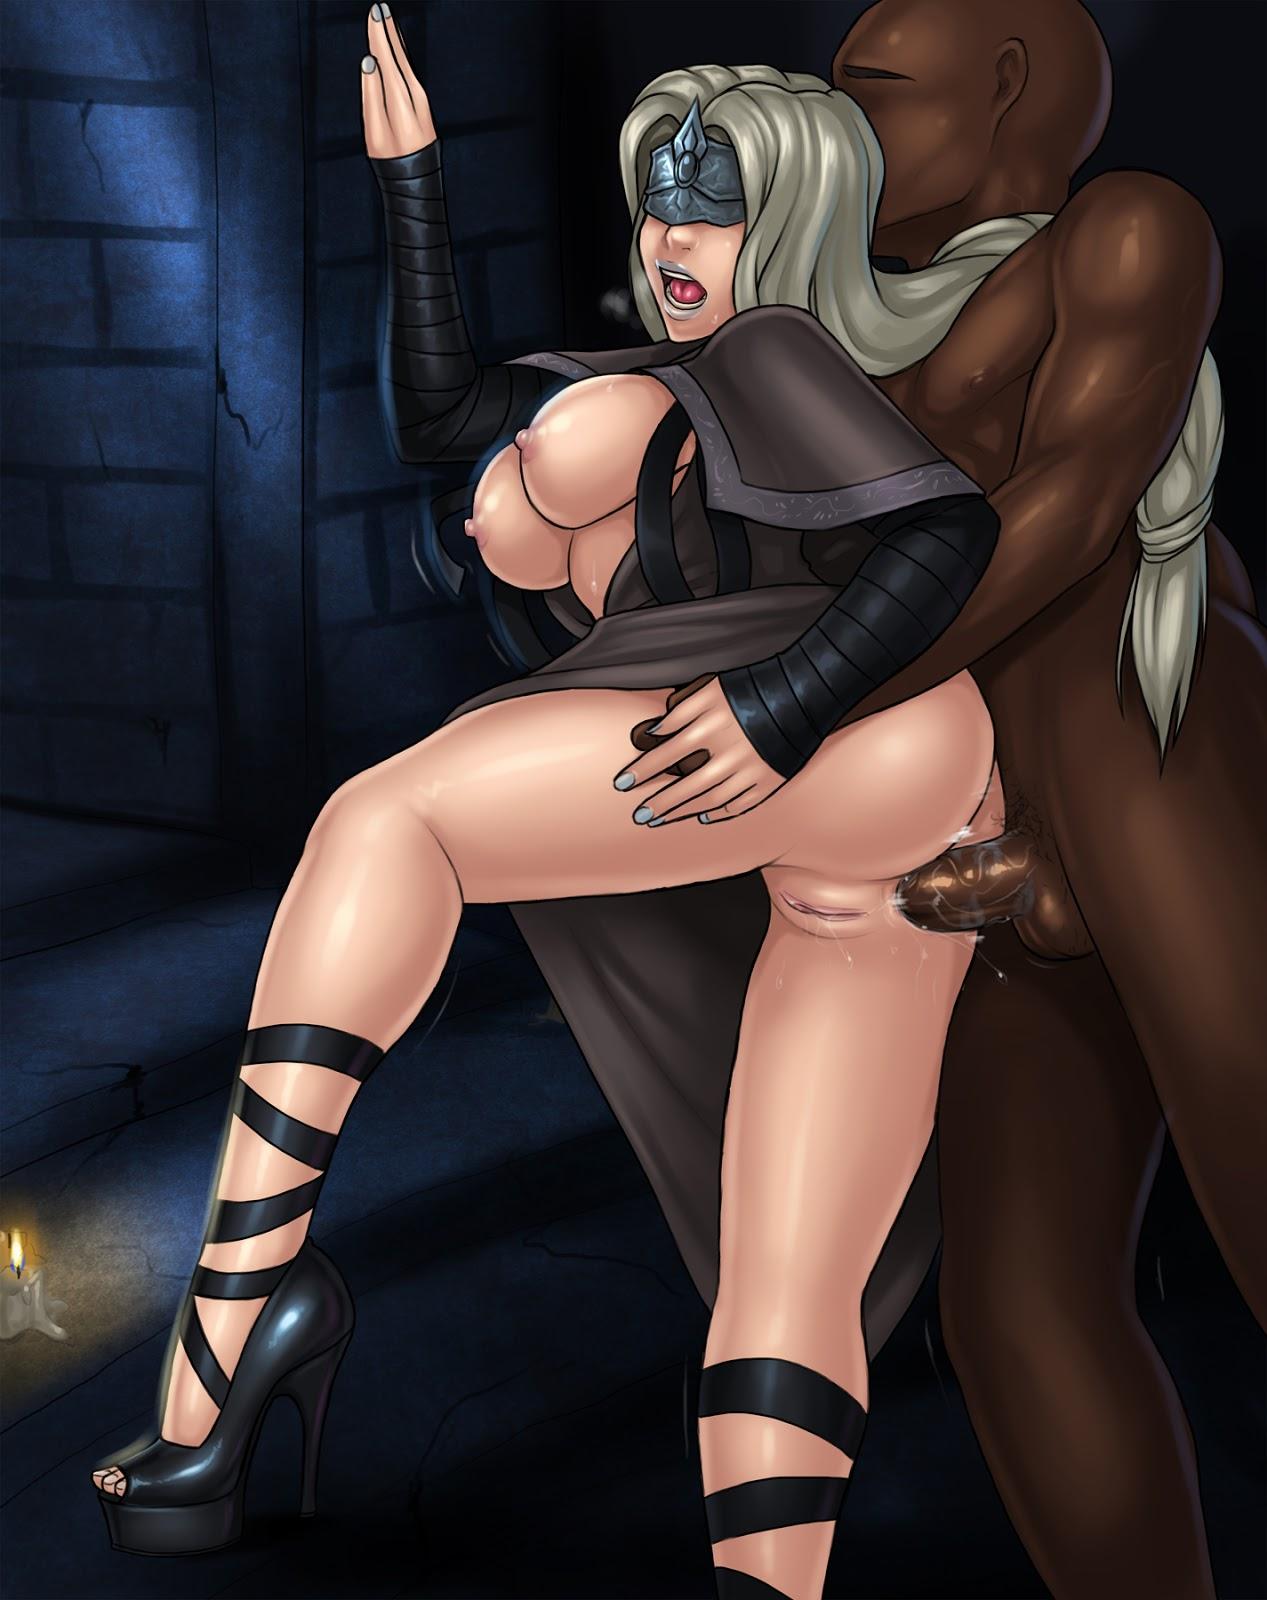 souls cat legs dark 2 World of warcraft female dwarf